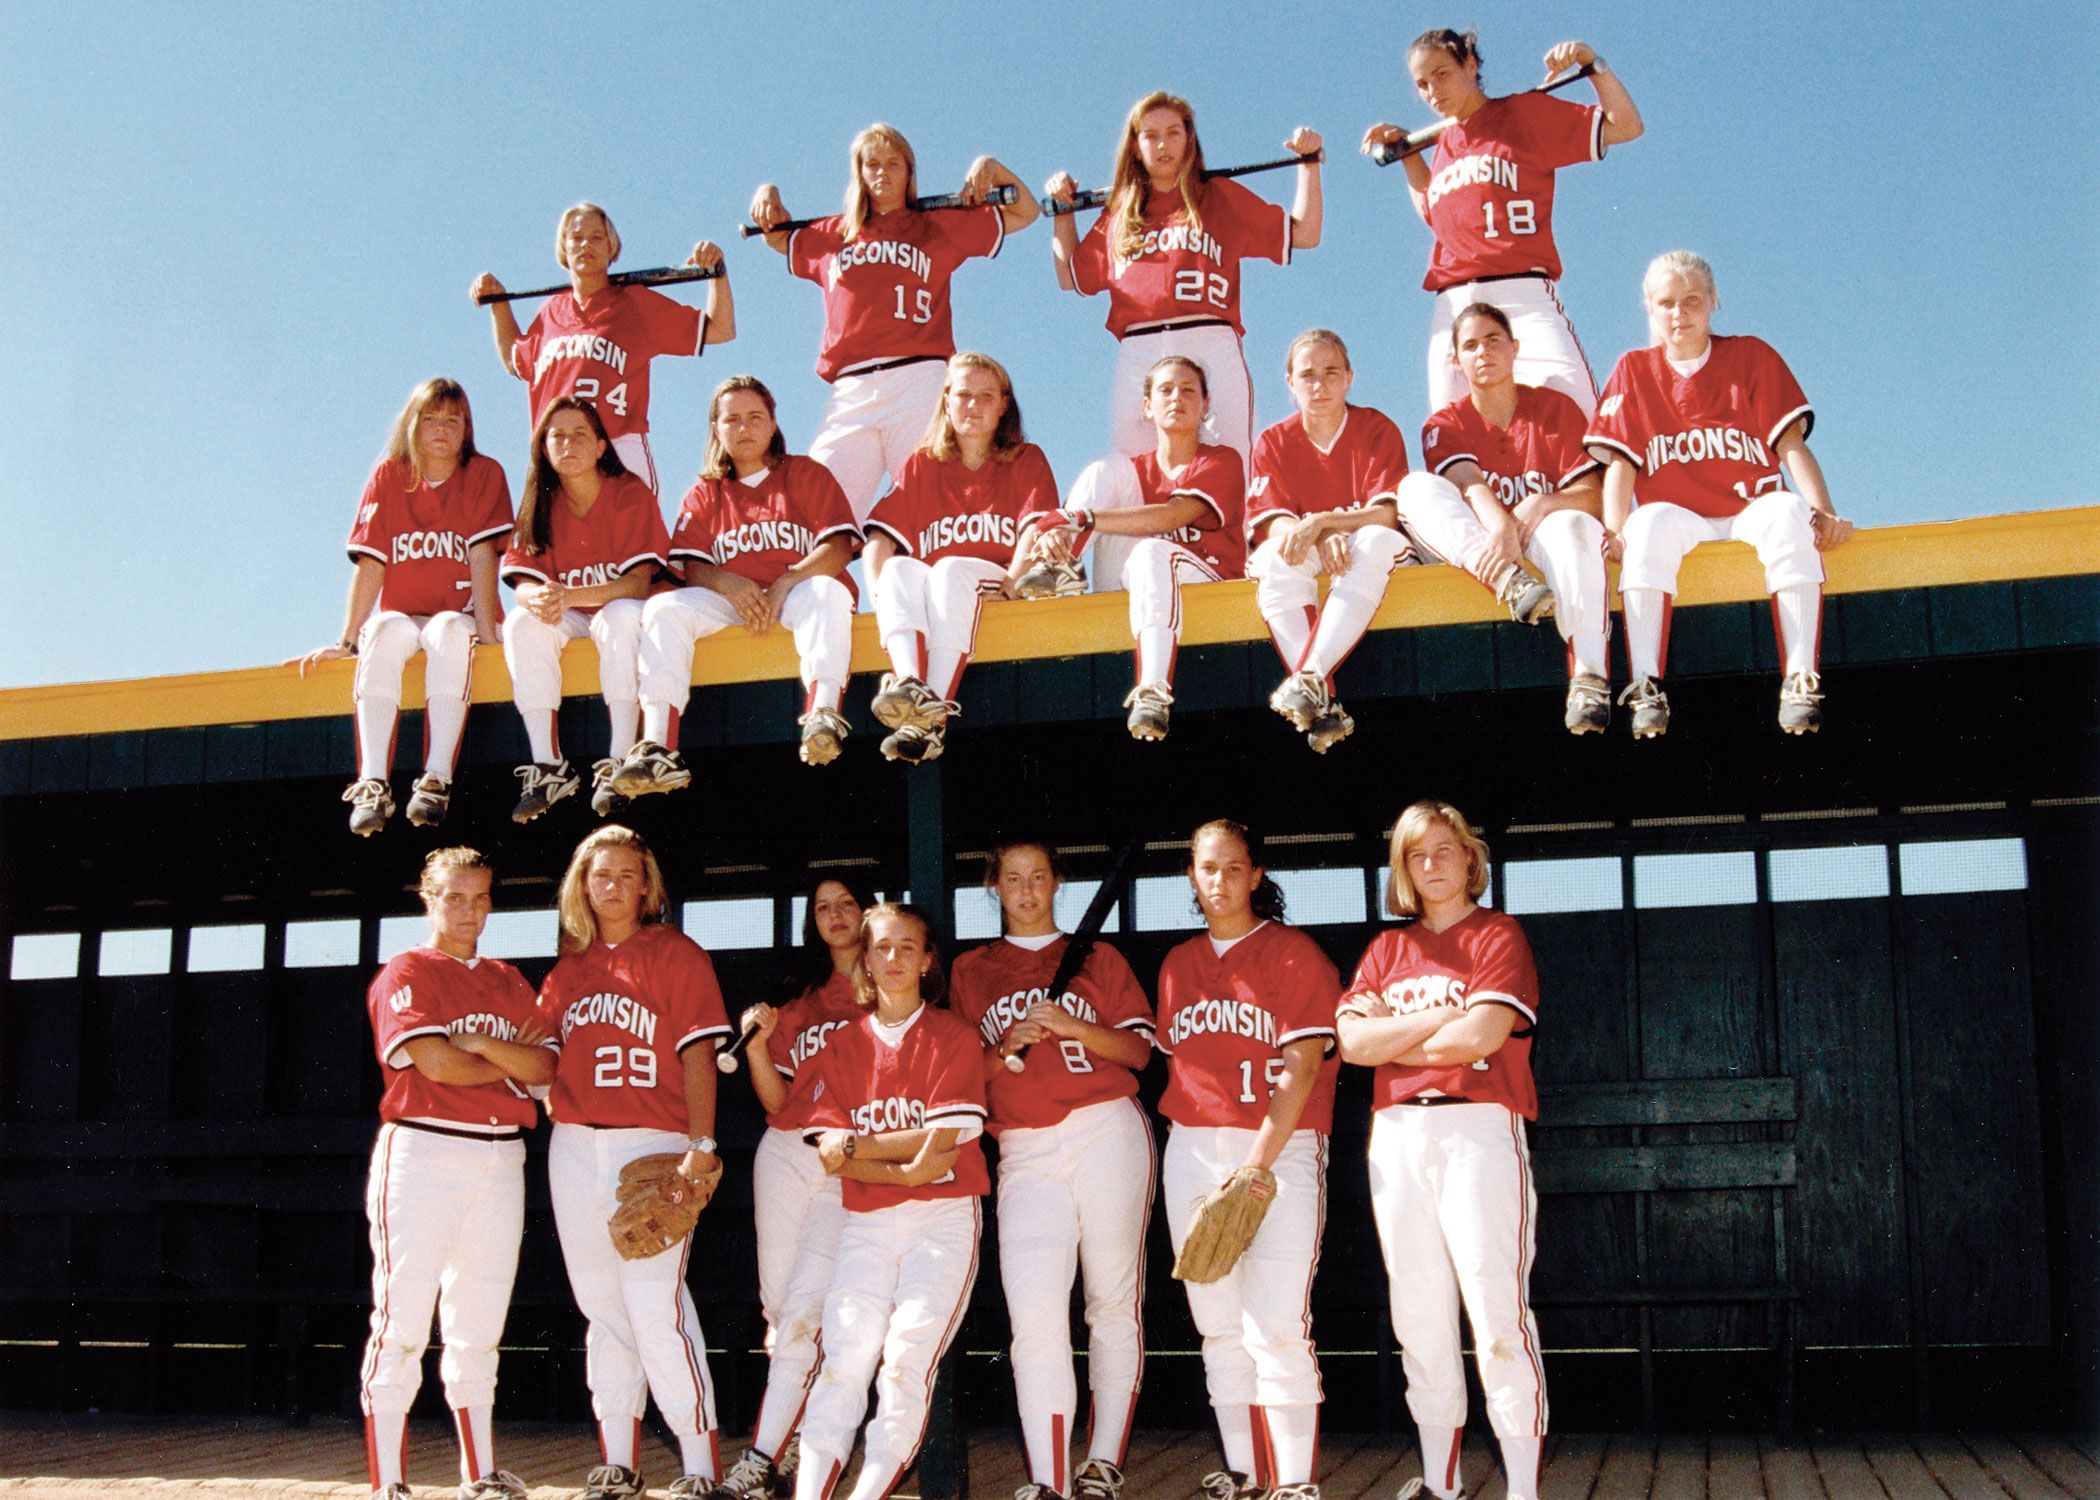 1997 Wisconsin Softball Team Softball Pictures Softball Pictures Poses Softball Photos